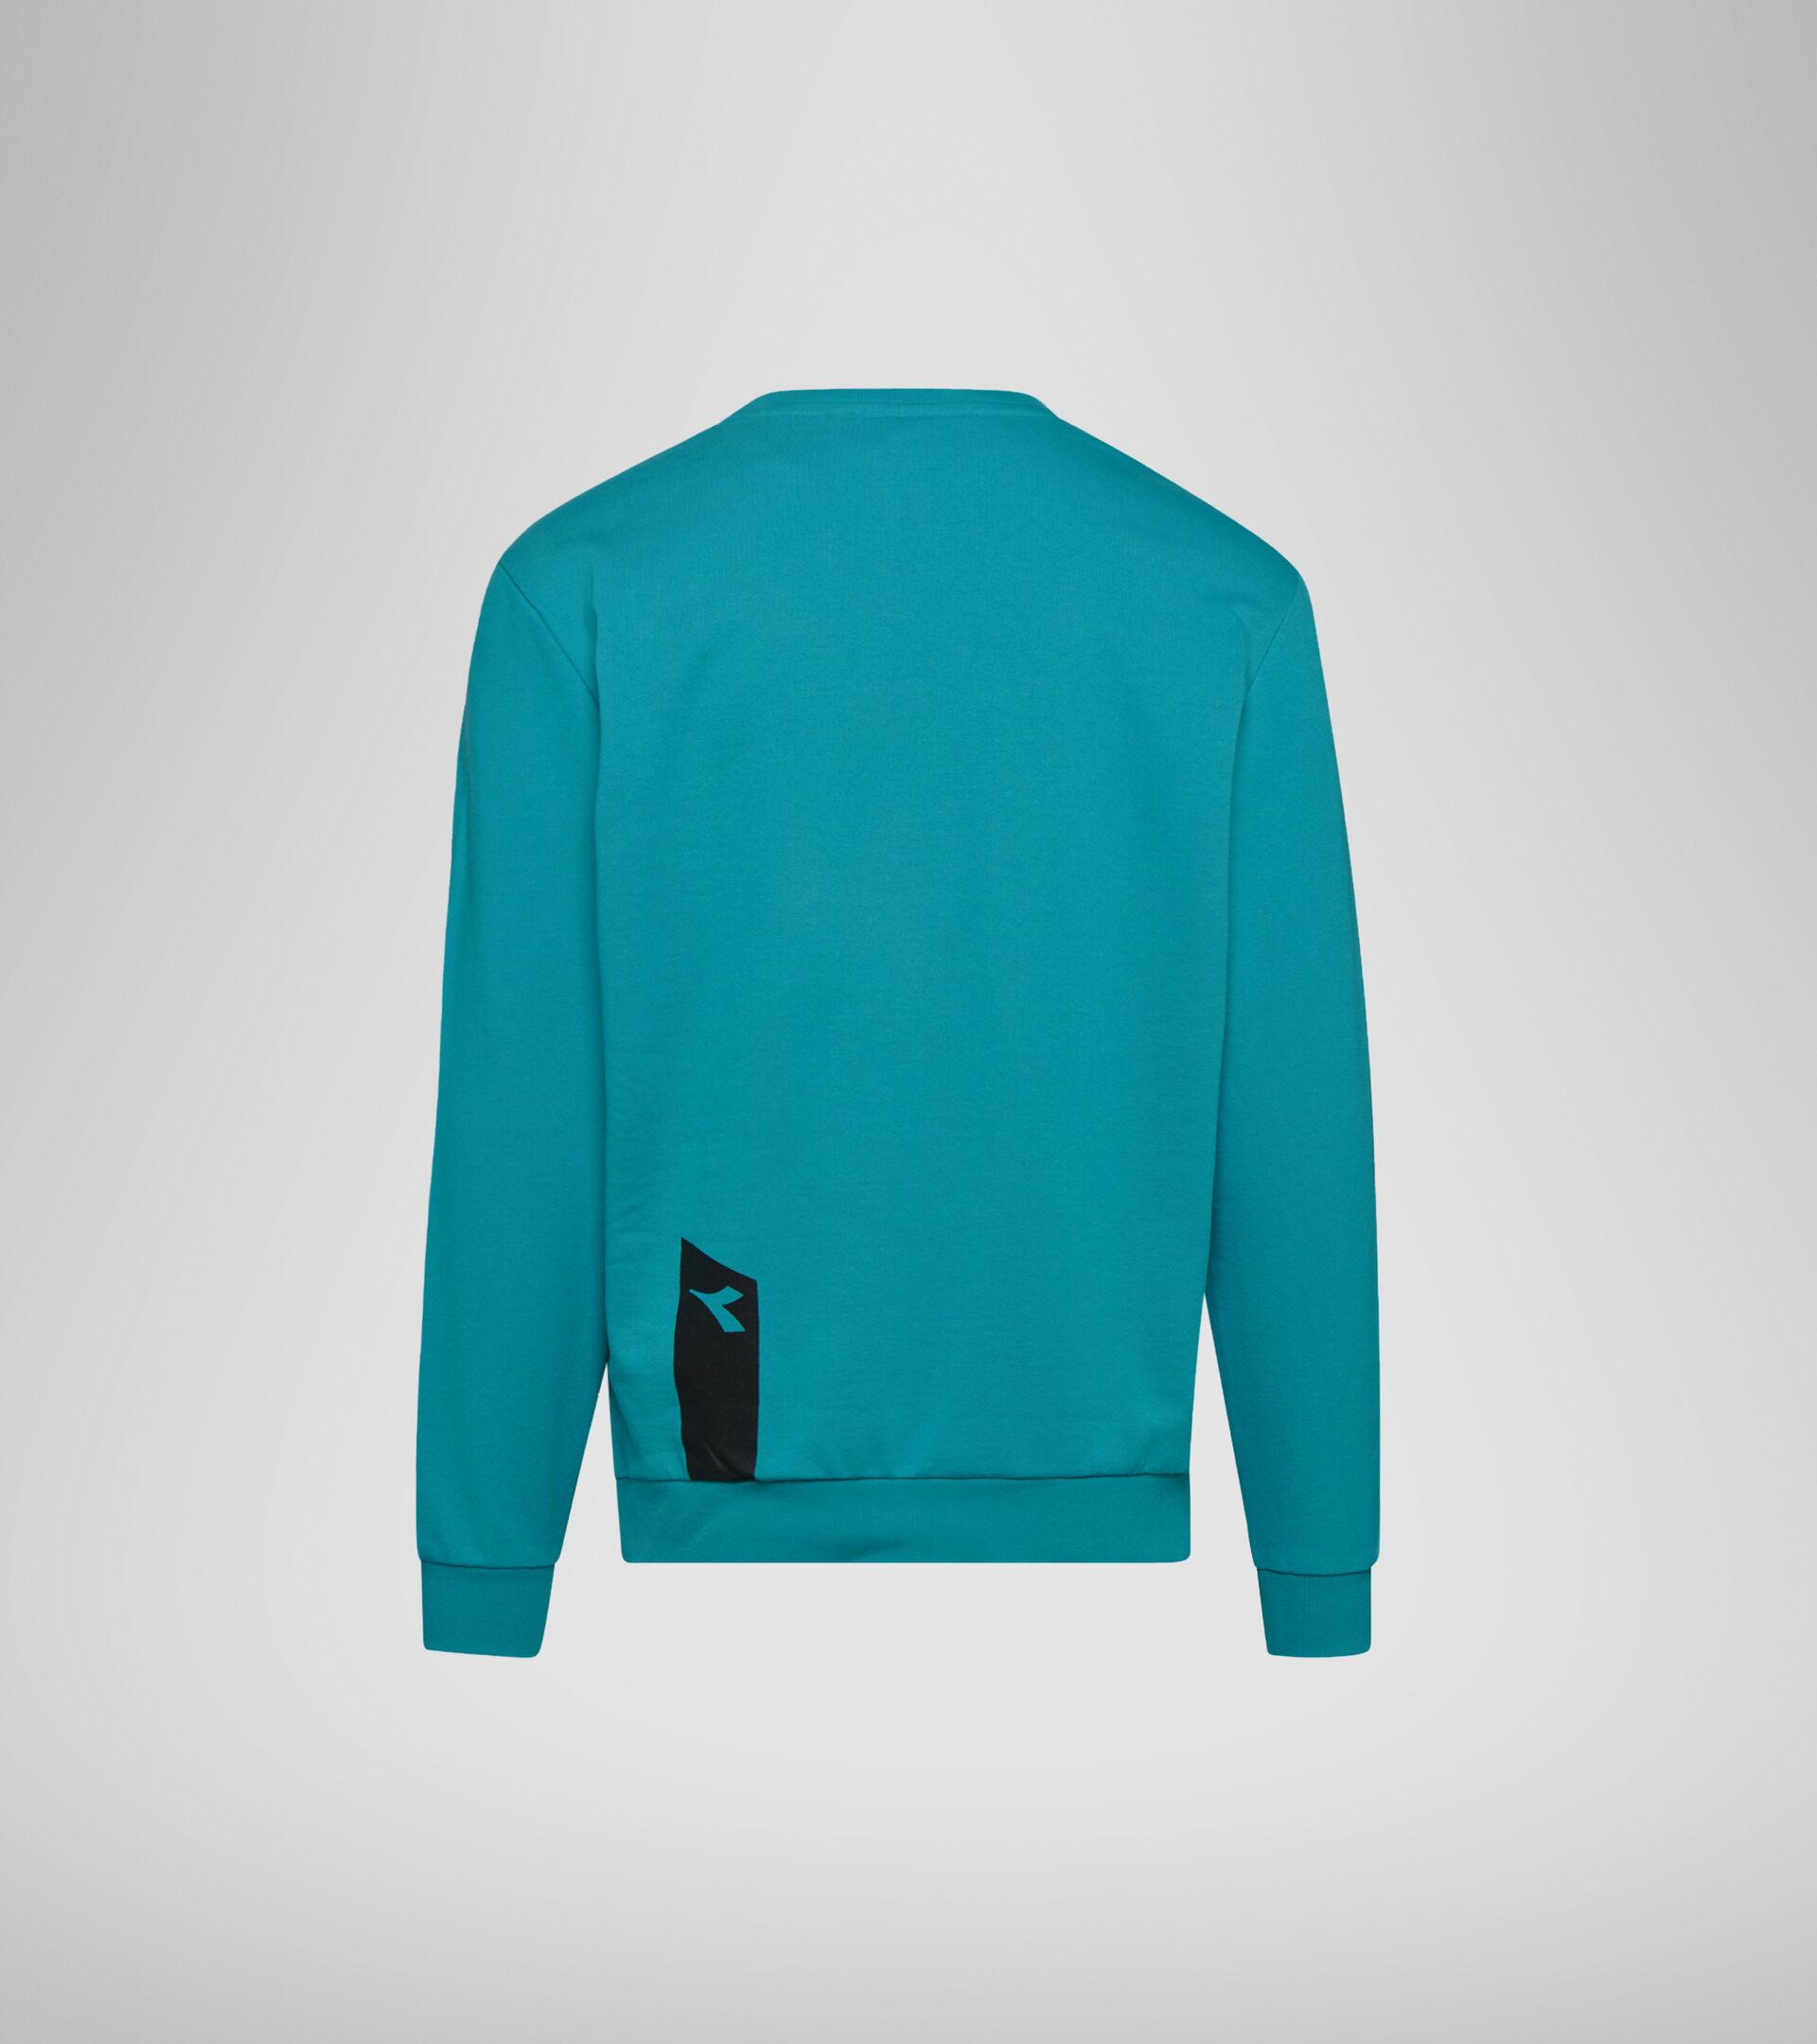 Apparel Sportswear UOMO SWEATSHIRT CREW ICON VERDE ACQUA Diadora